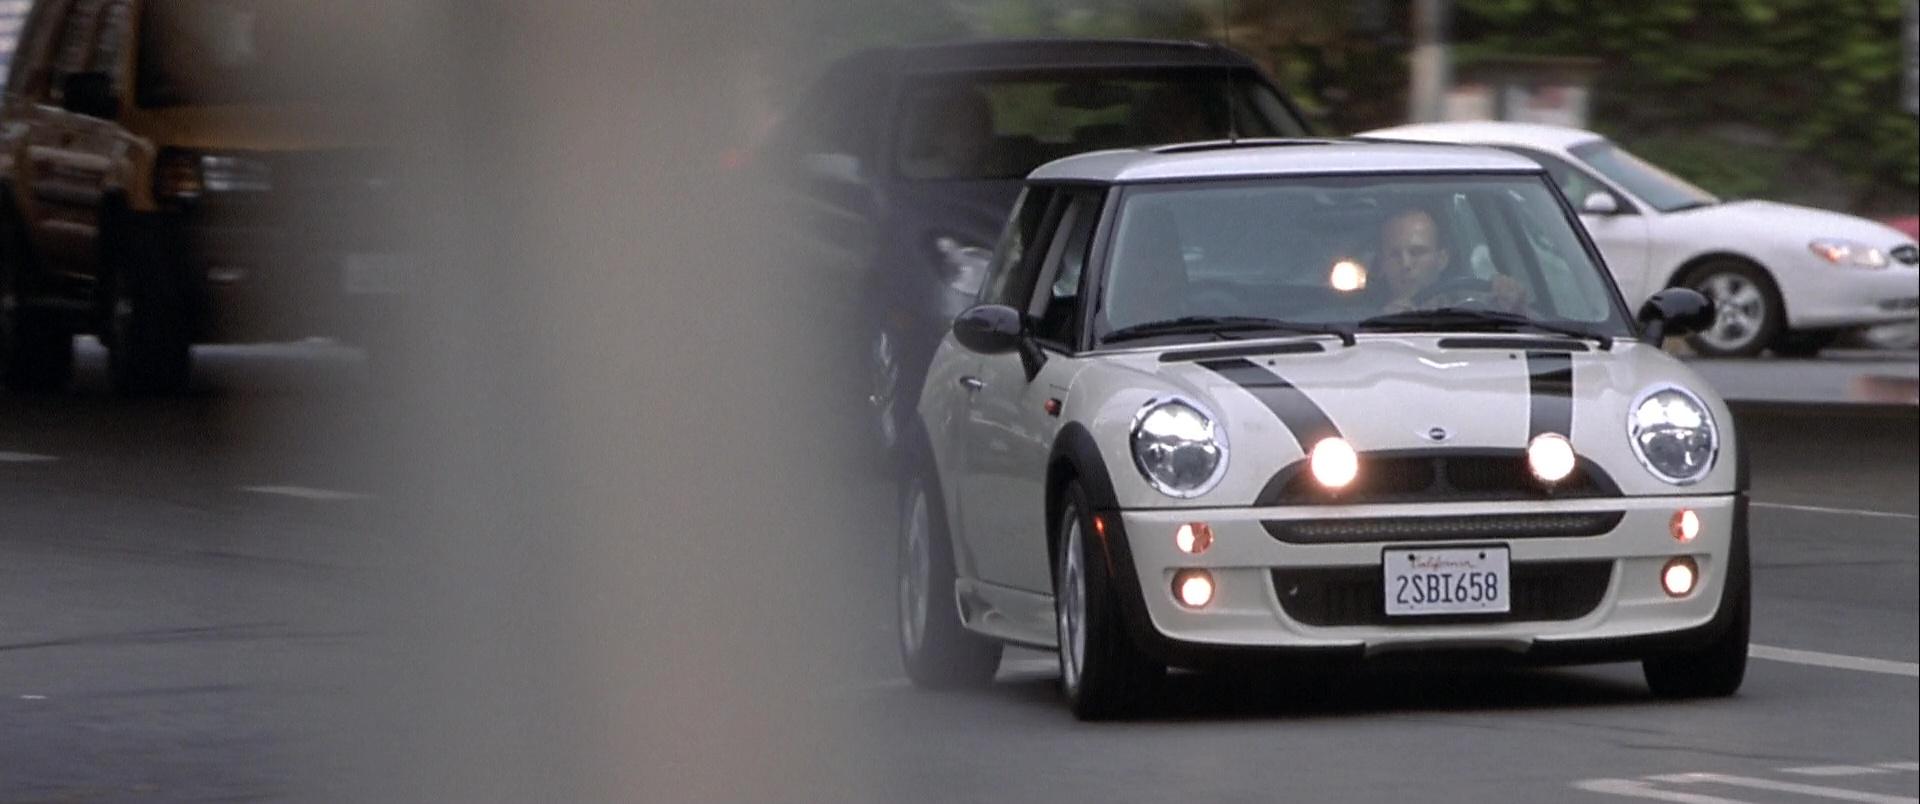 Mini Cooper S White Car Used By Jason Statham In The Italian Job